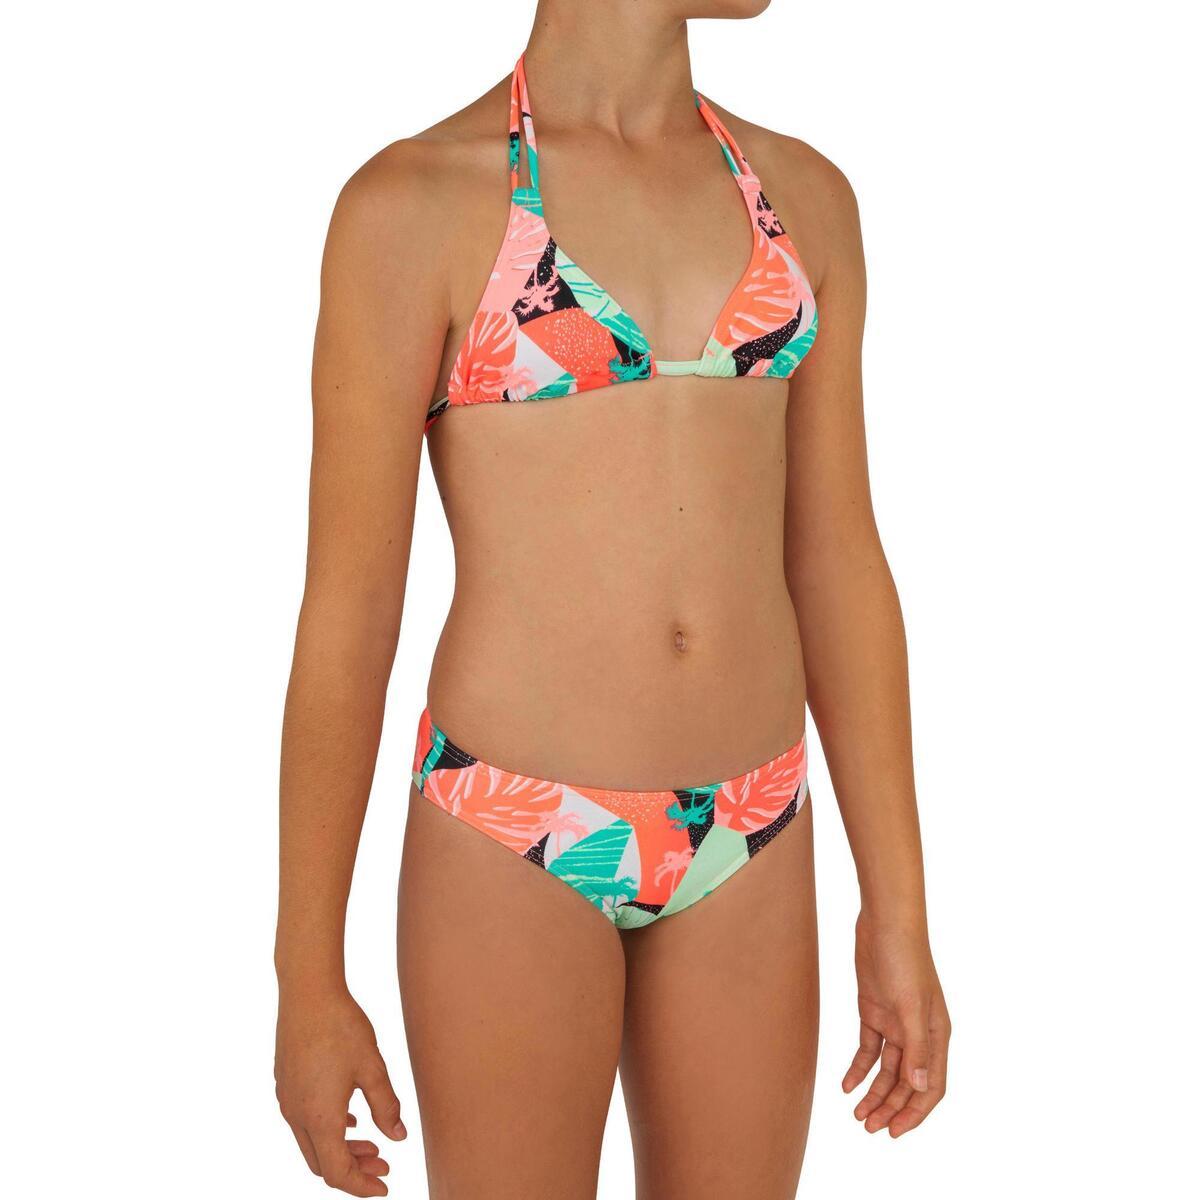 Bild 1 von Bikini-Set Triangel Taloo Lilou Origami Surfen Mädchen neon-rosa